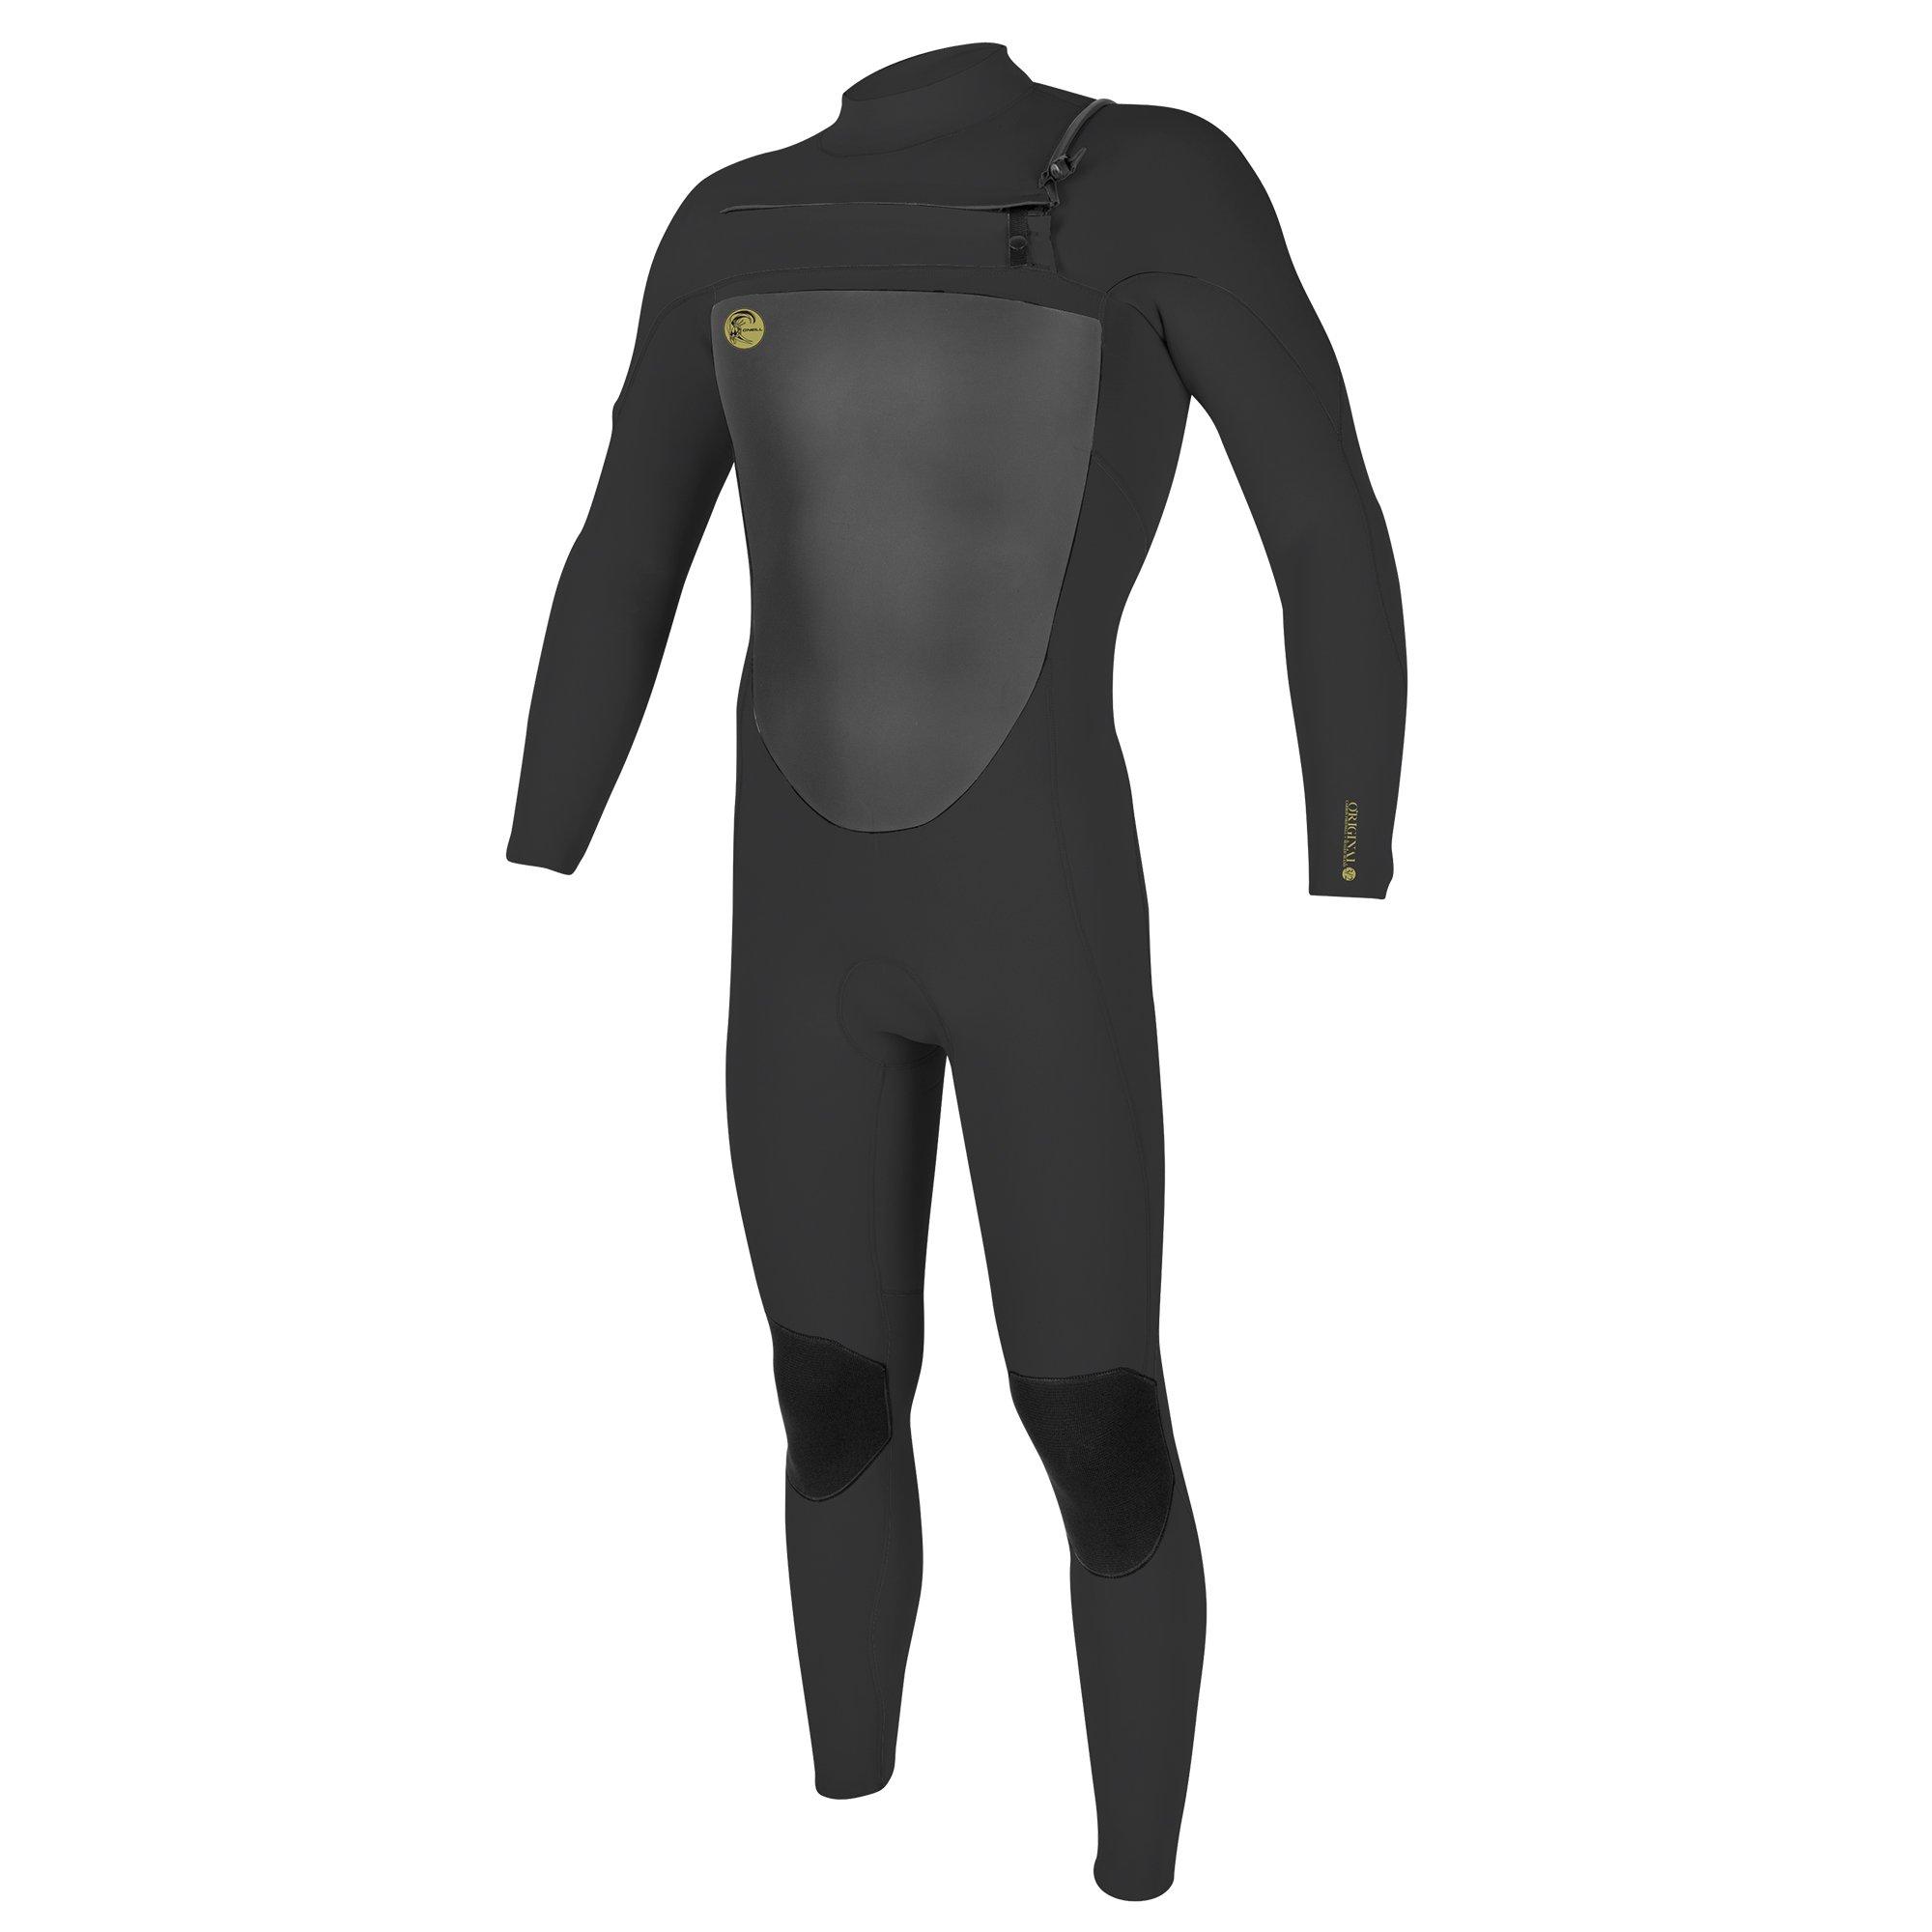 O'Neill Men's O'Riginal 3/2 mm Chest Zip Full Wetsuit, Oil/Oil, Small